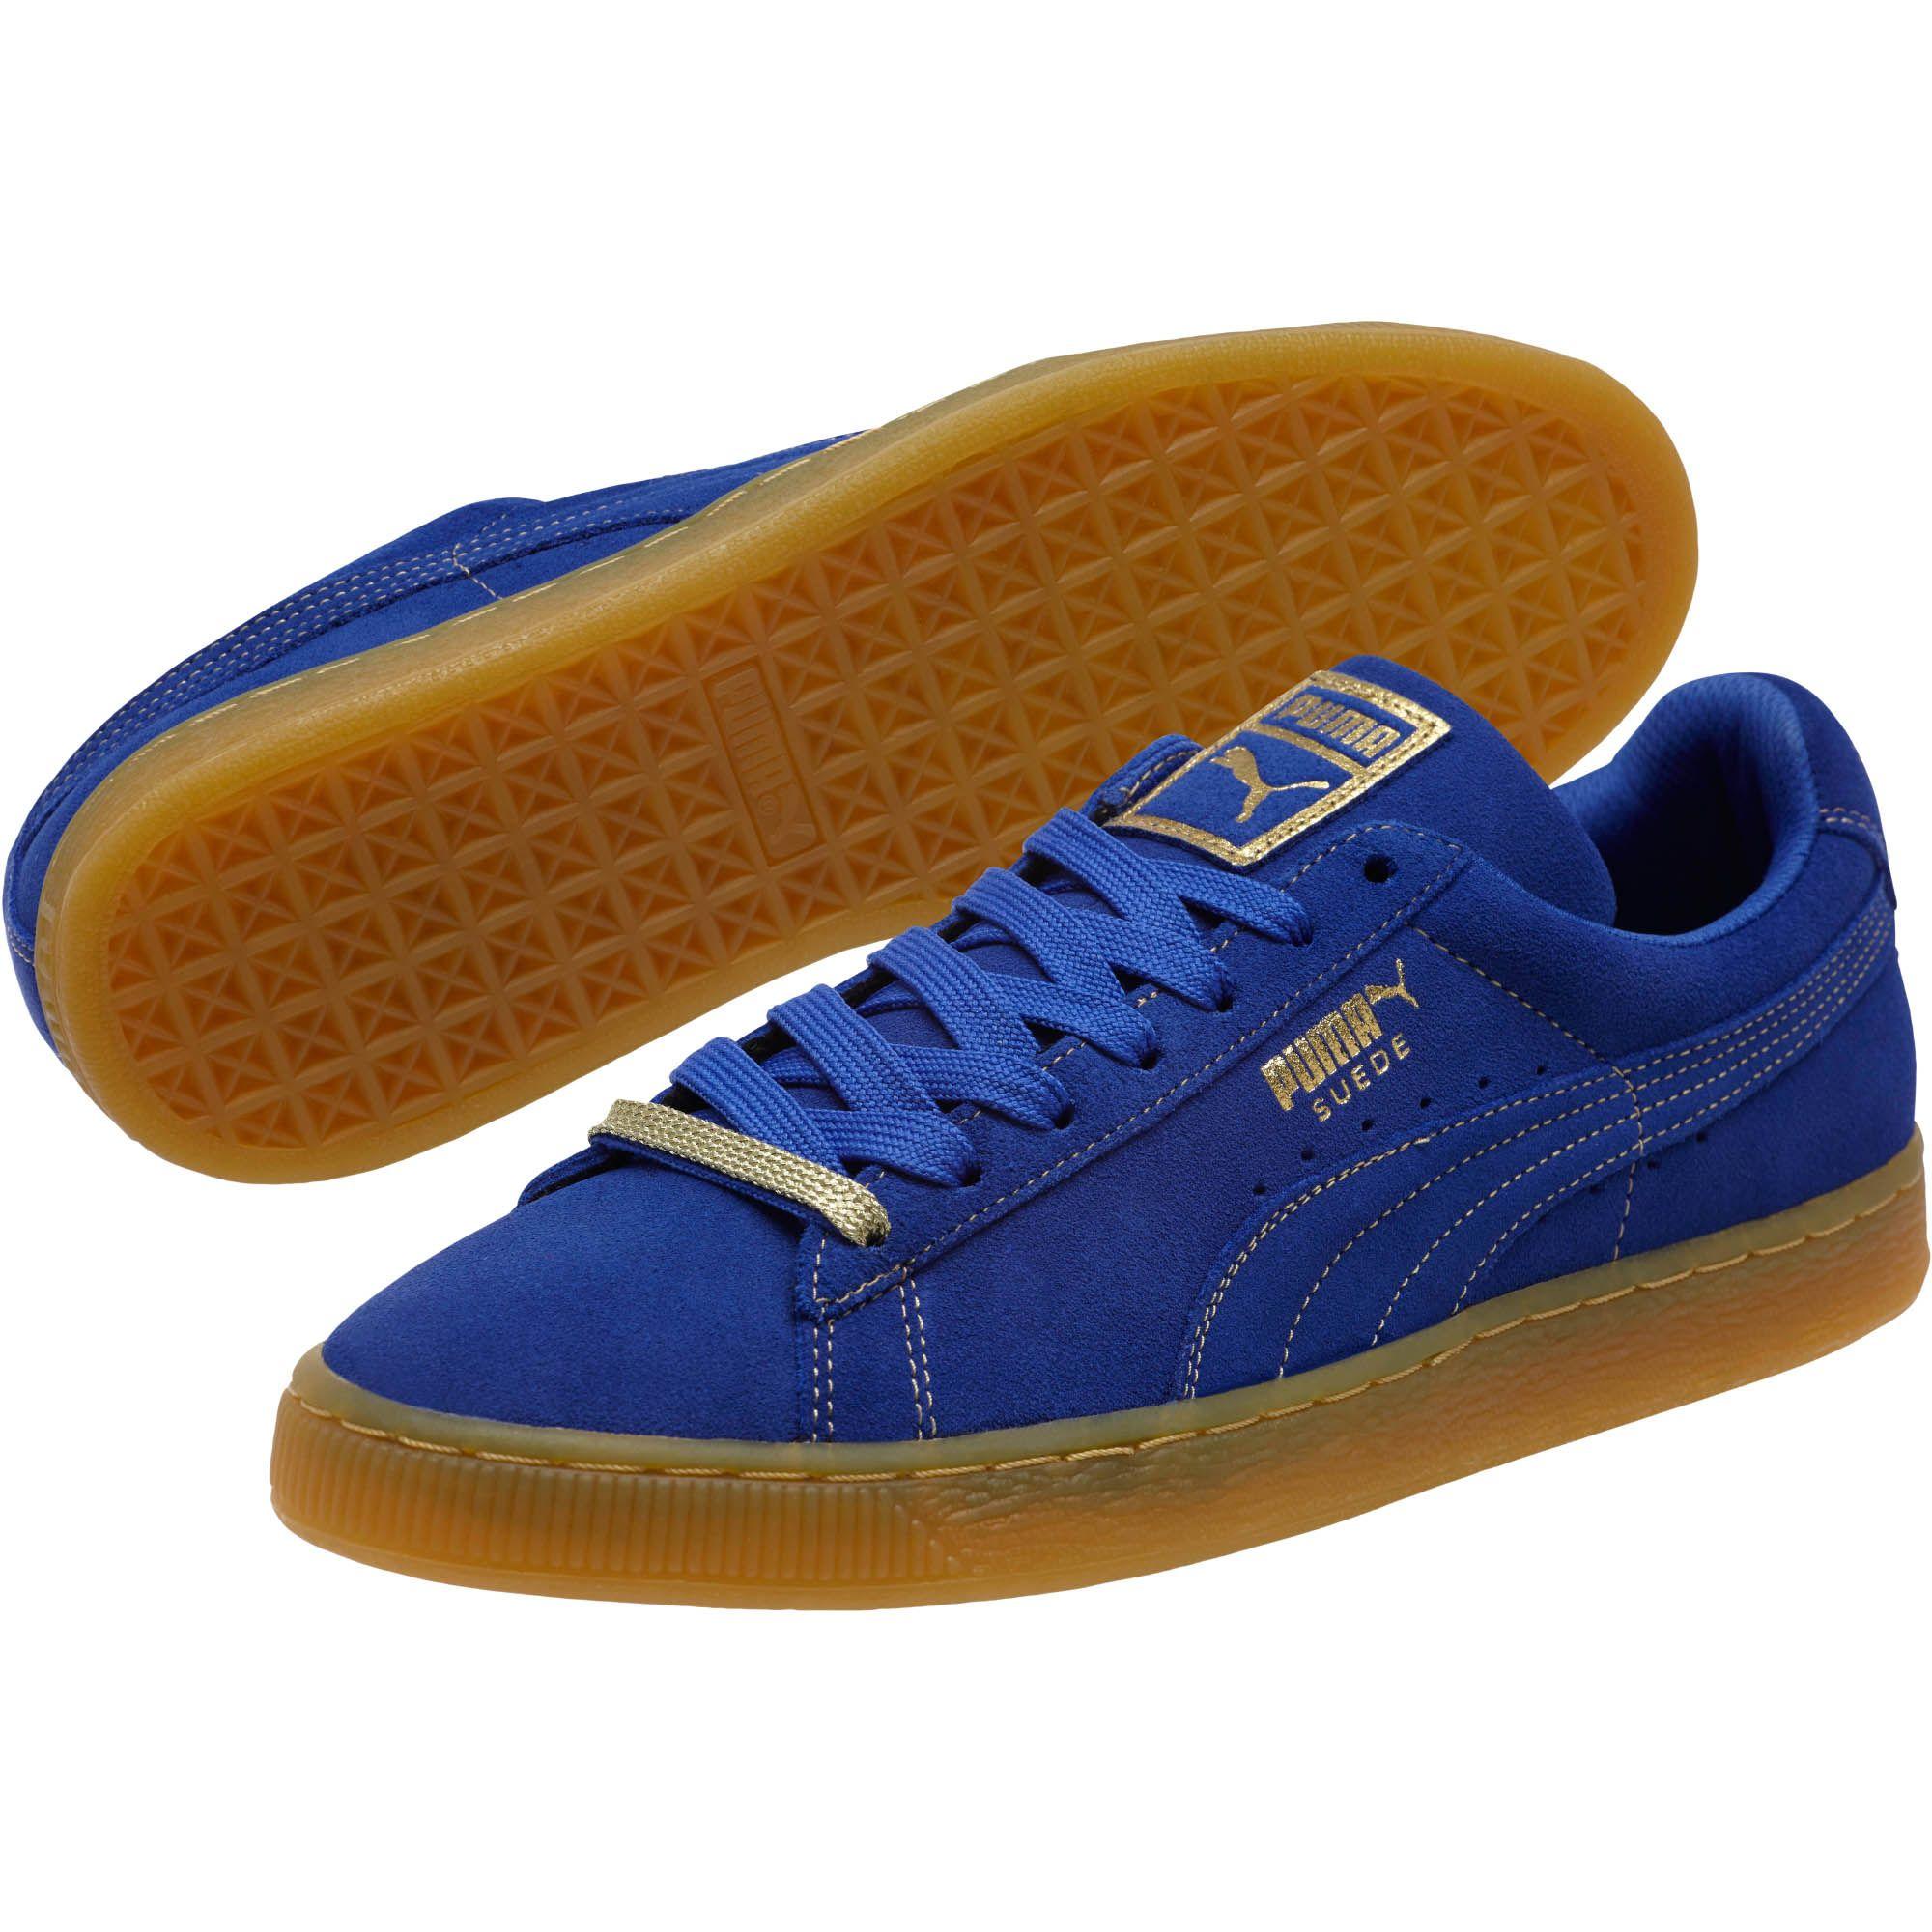 Puma Cat Suede Shoes